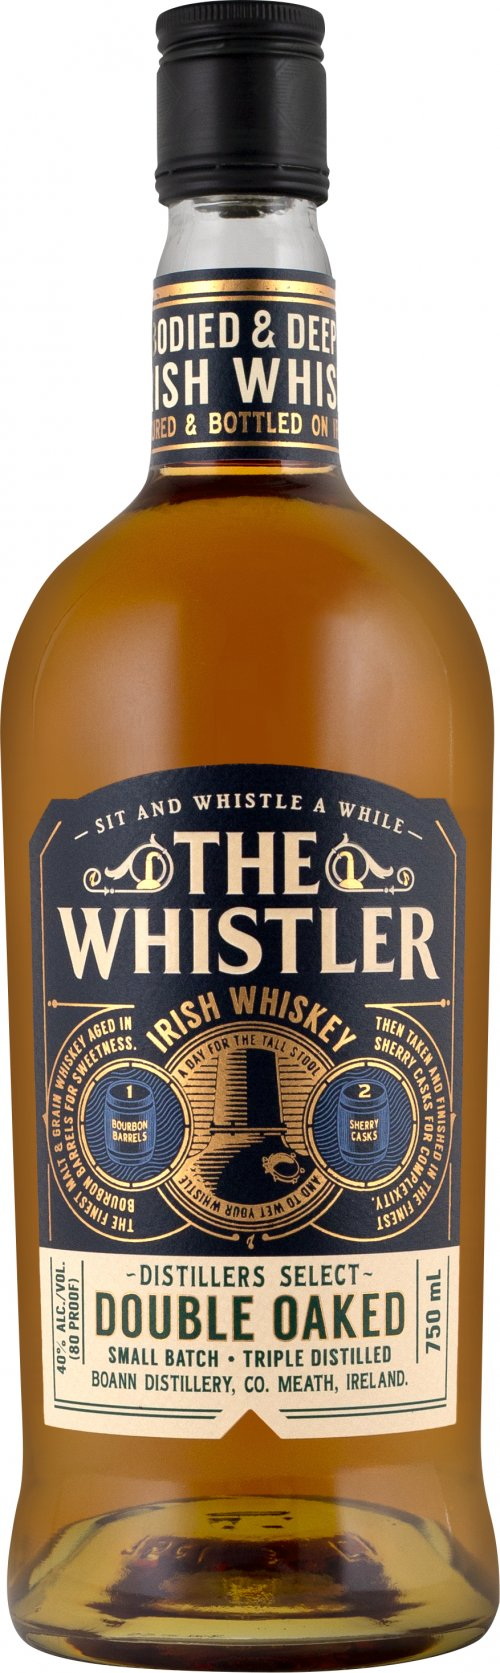 Whistler Double Oaked Irish Whiskey